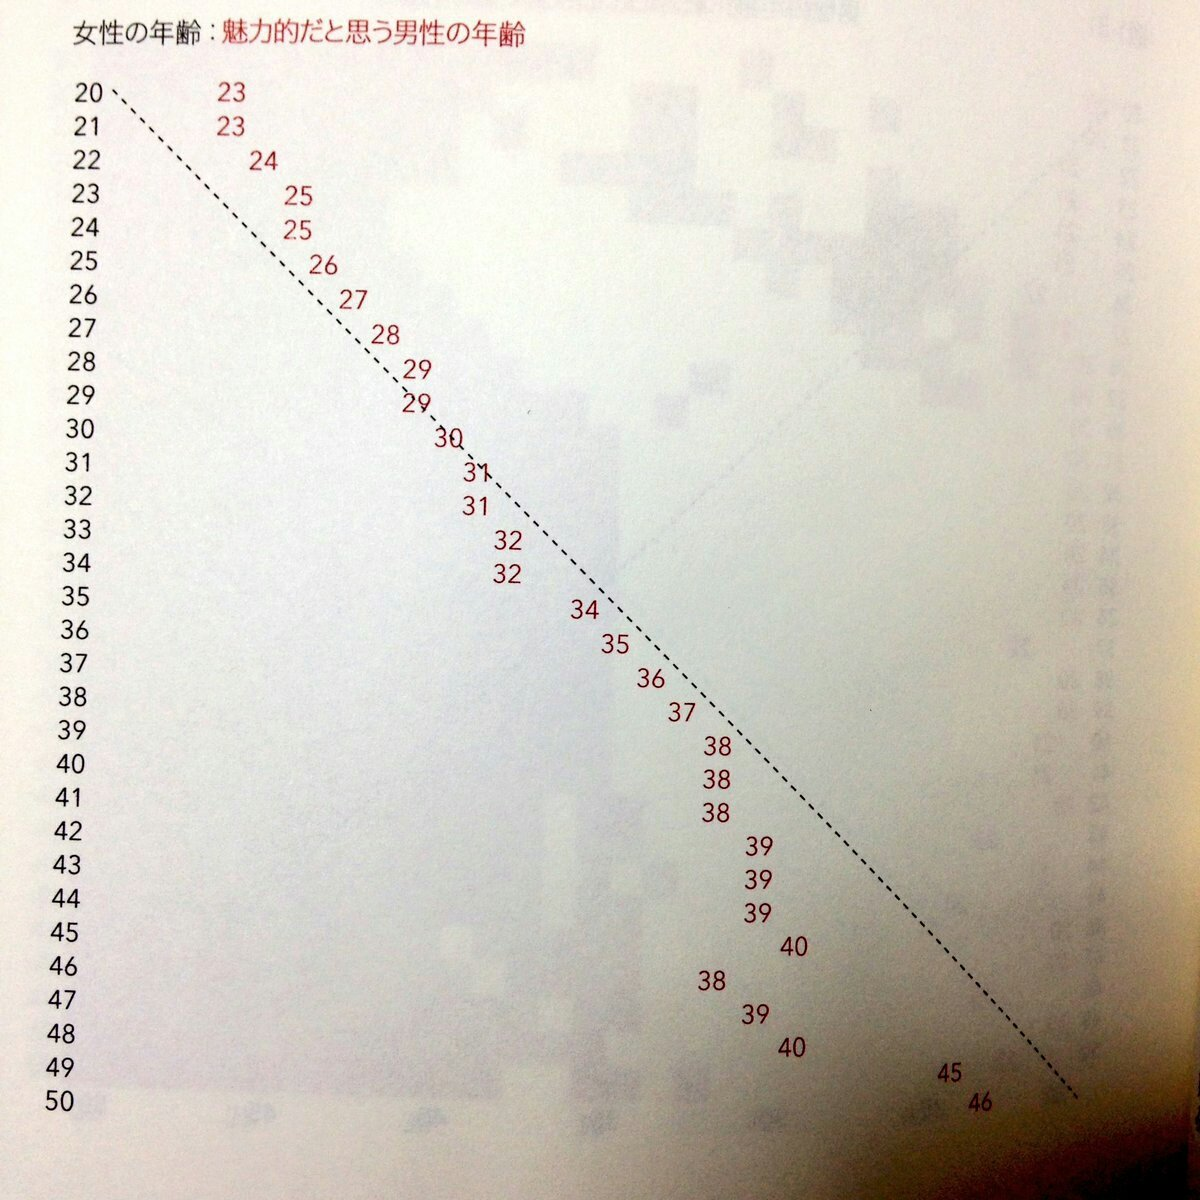 https://i1.wp.com/livedoor.blogimg.jp/news4wide/imgs/c/0/c0f72ecf.jpg